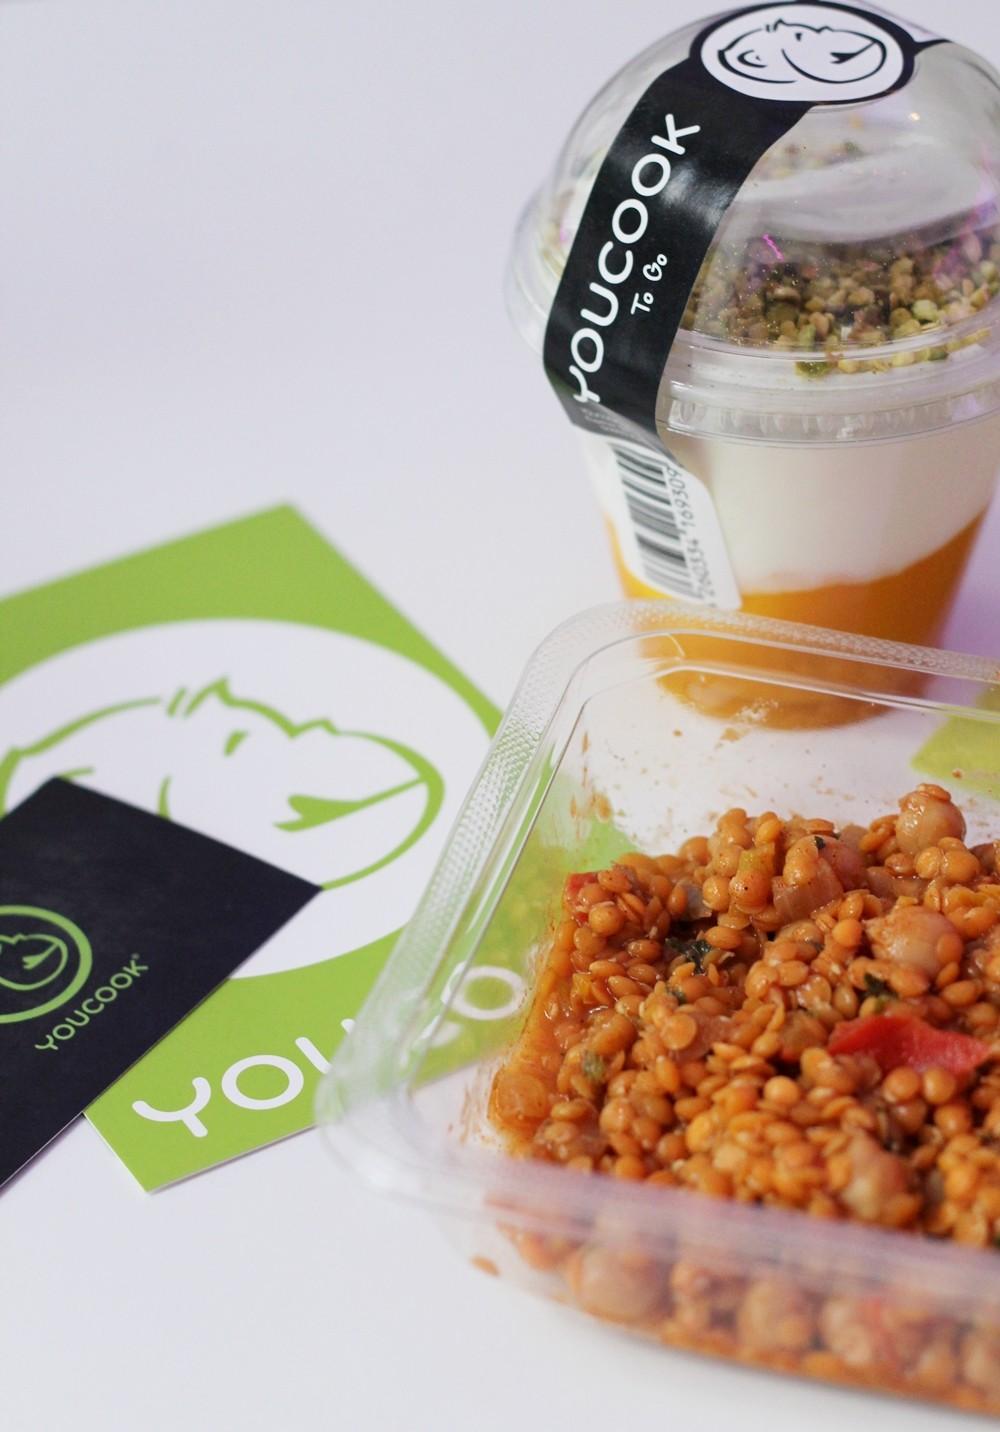 Youcook Hashmag Bloggerlounge Linsensalat Joghurt